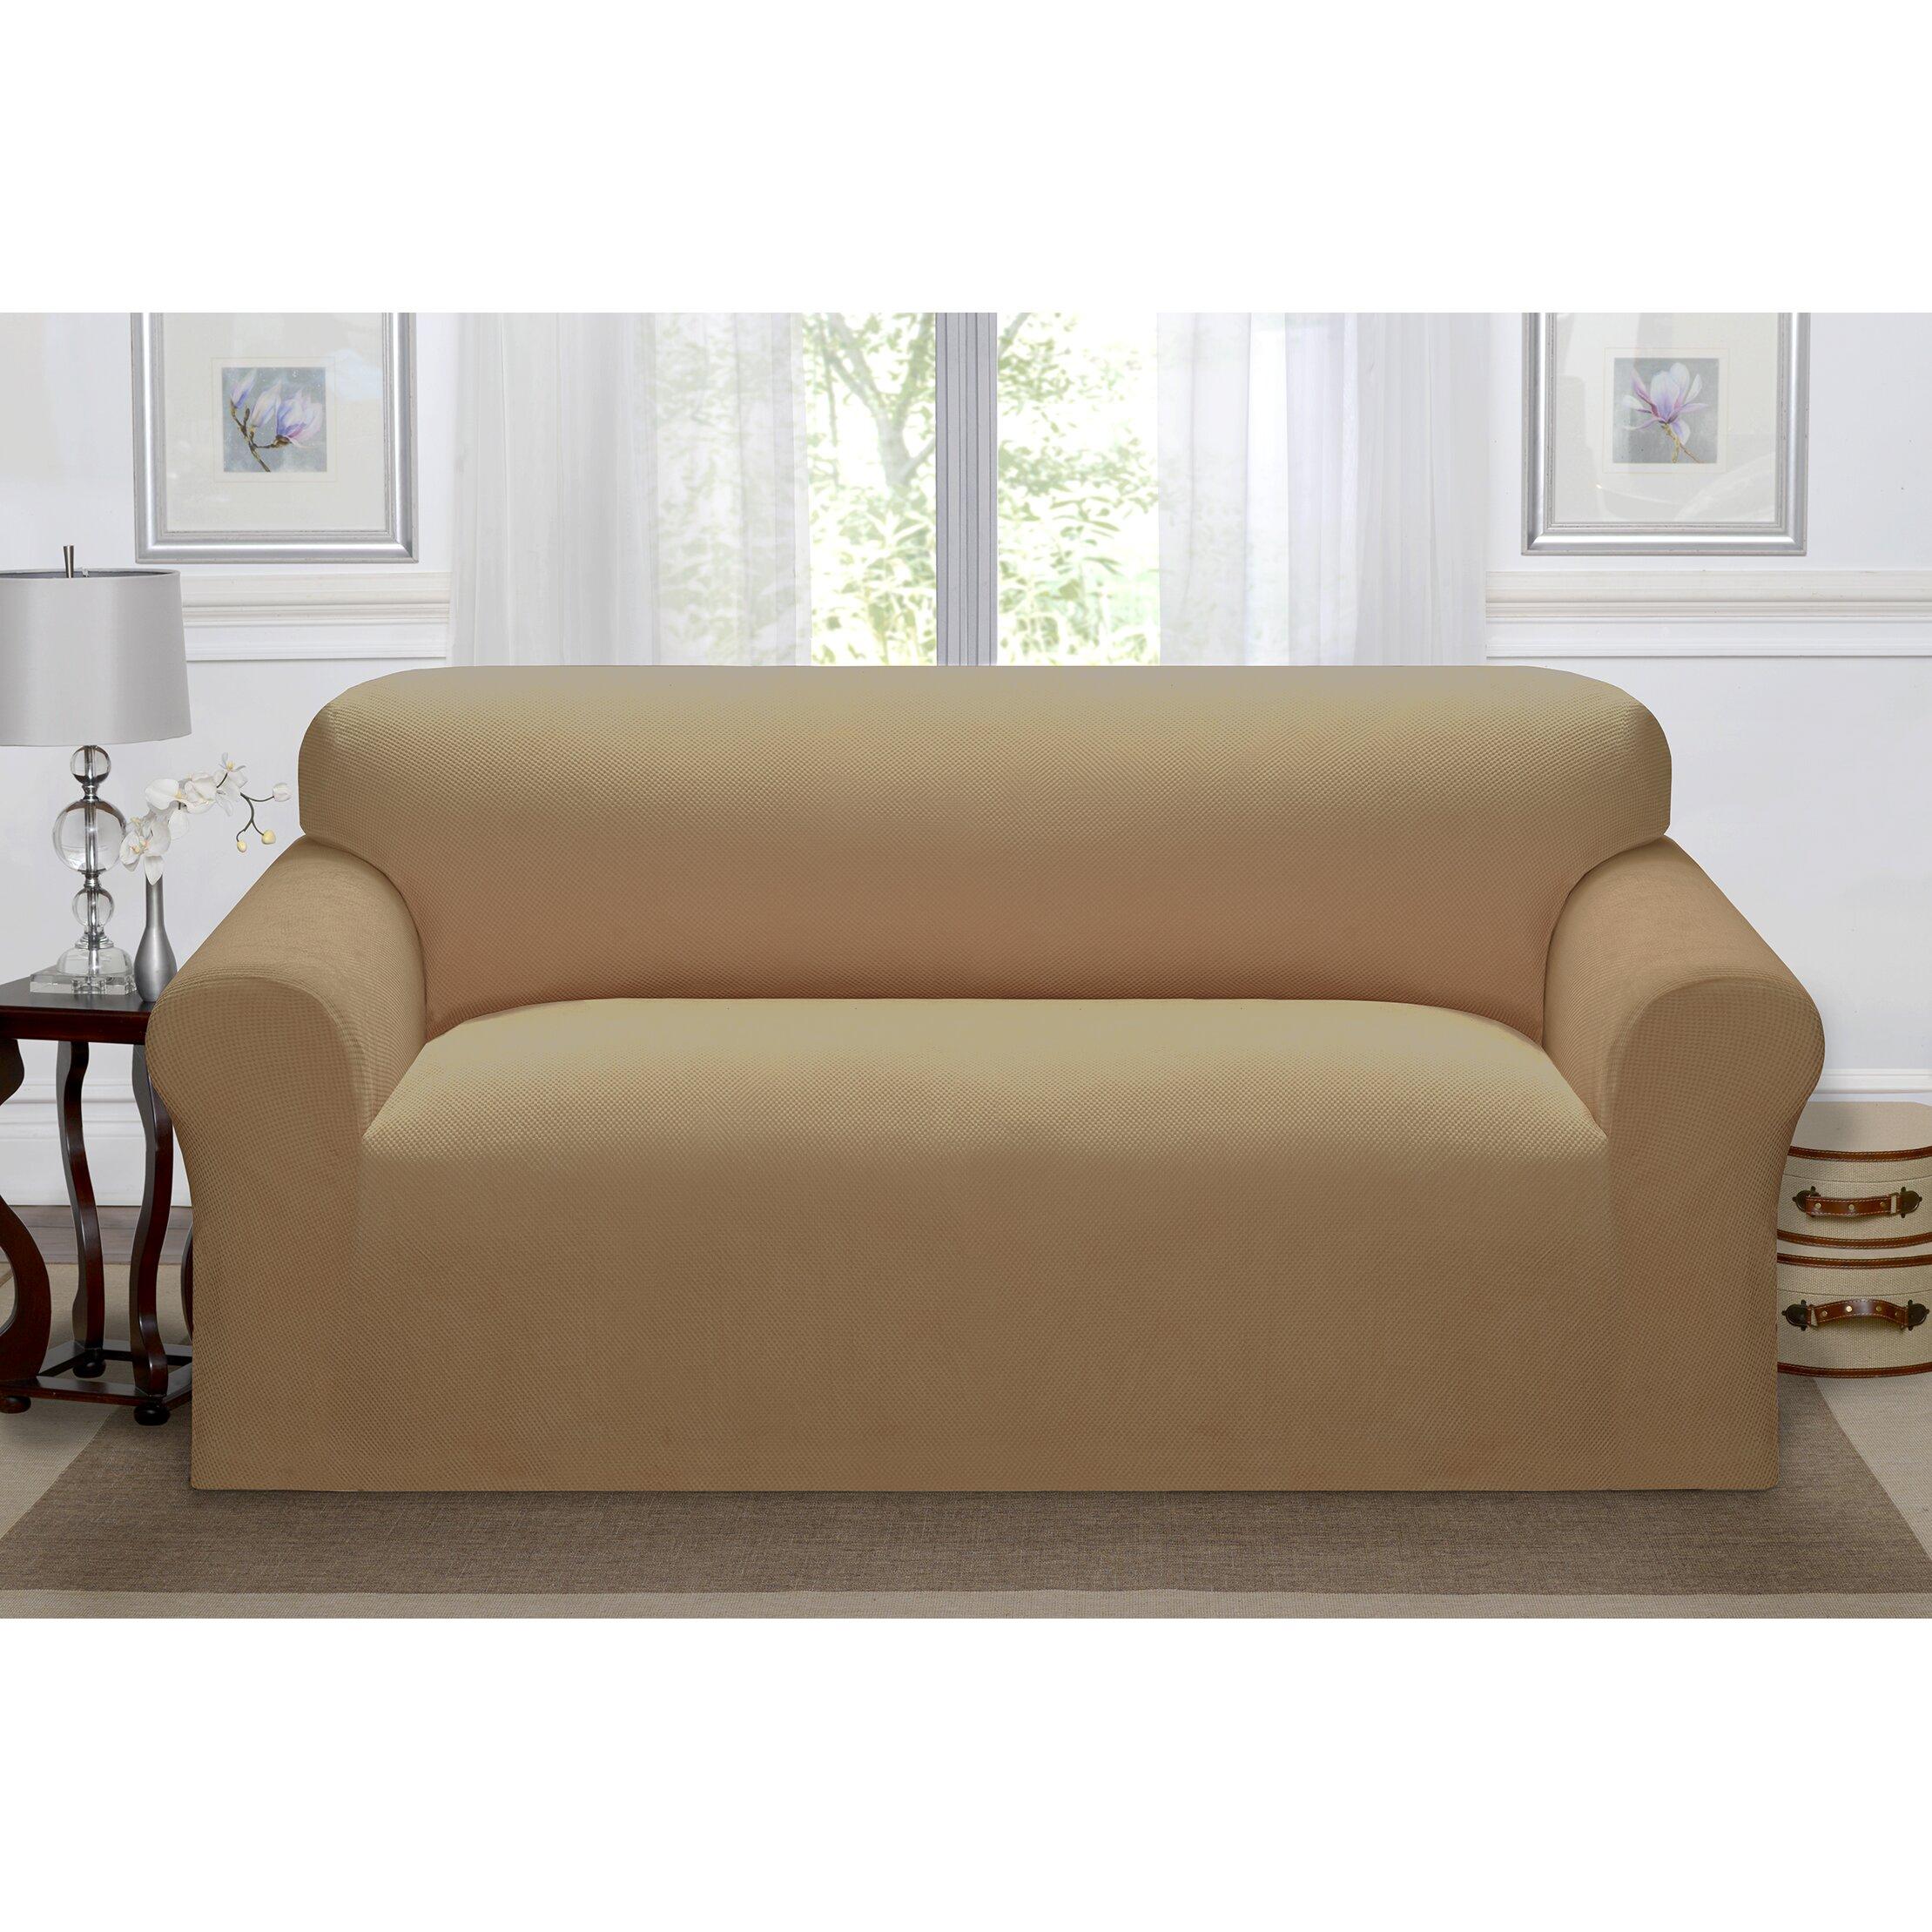 3 Seater Sofa Covers Ireland Velcromag